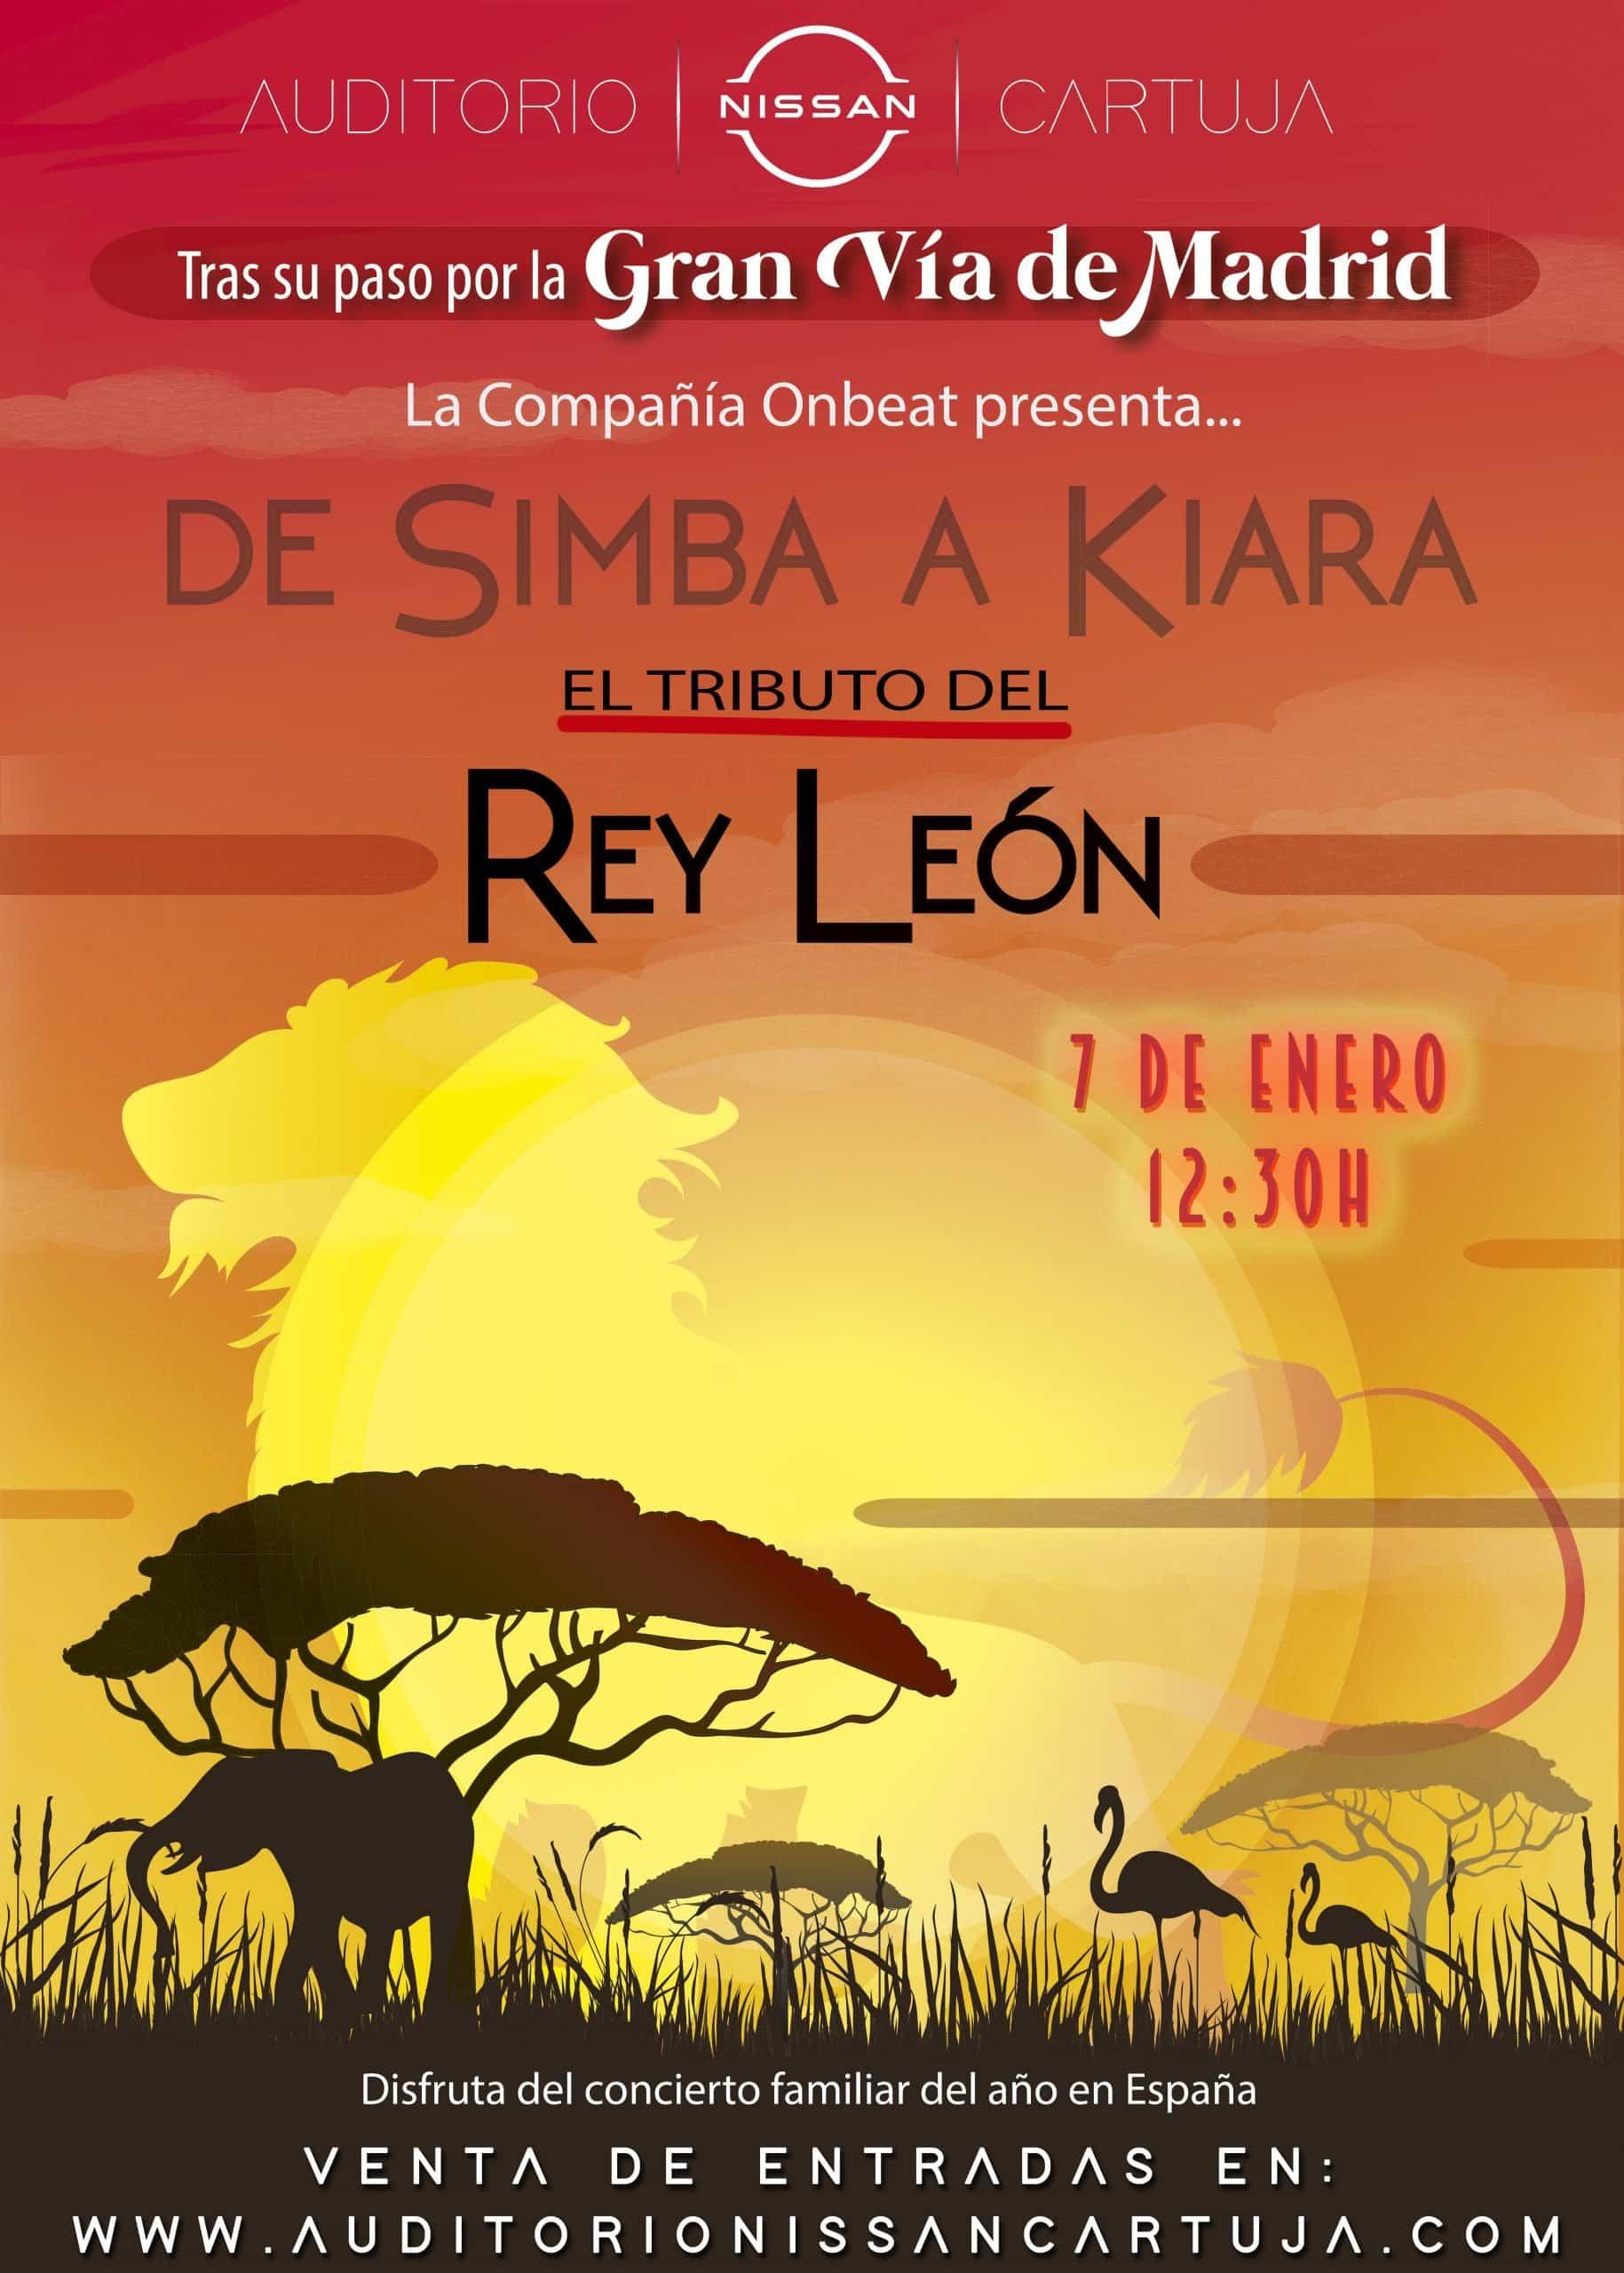 DE SIMBA A KIARA – TRIBUTO DEL REY LEÓN